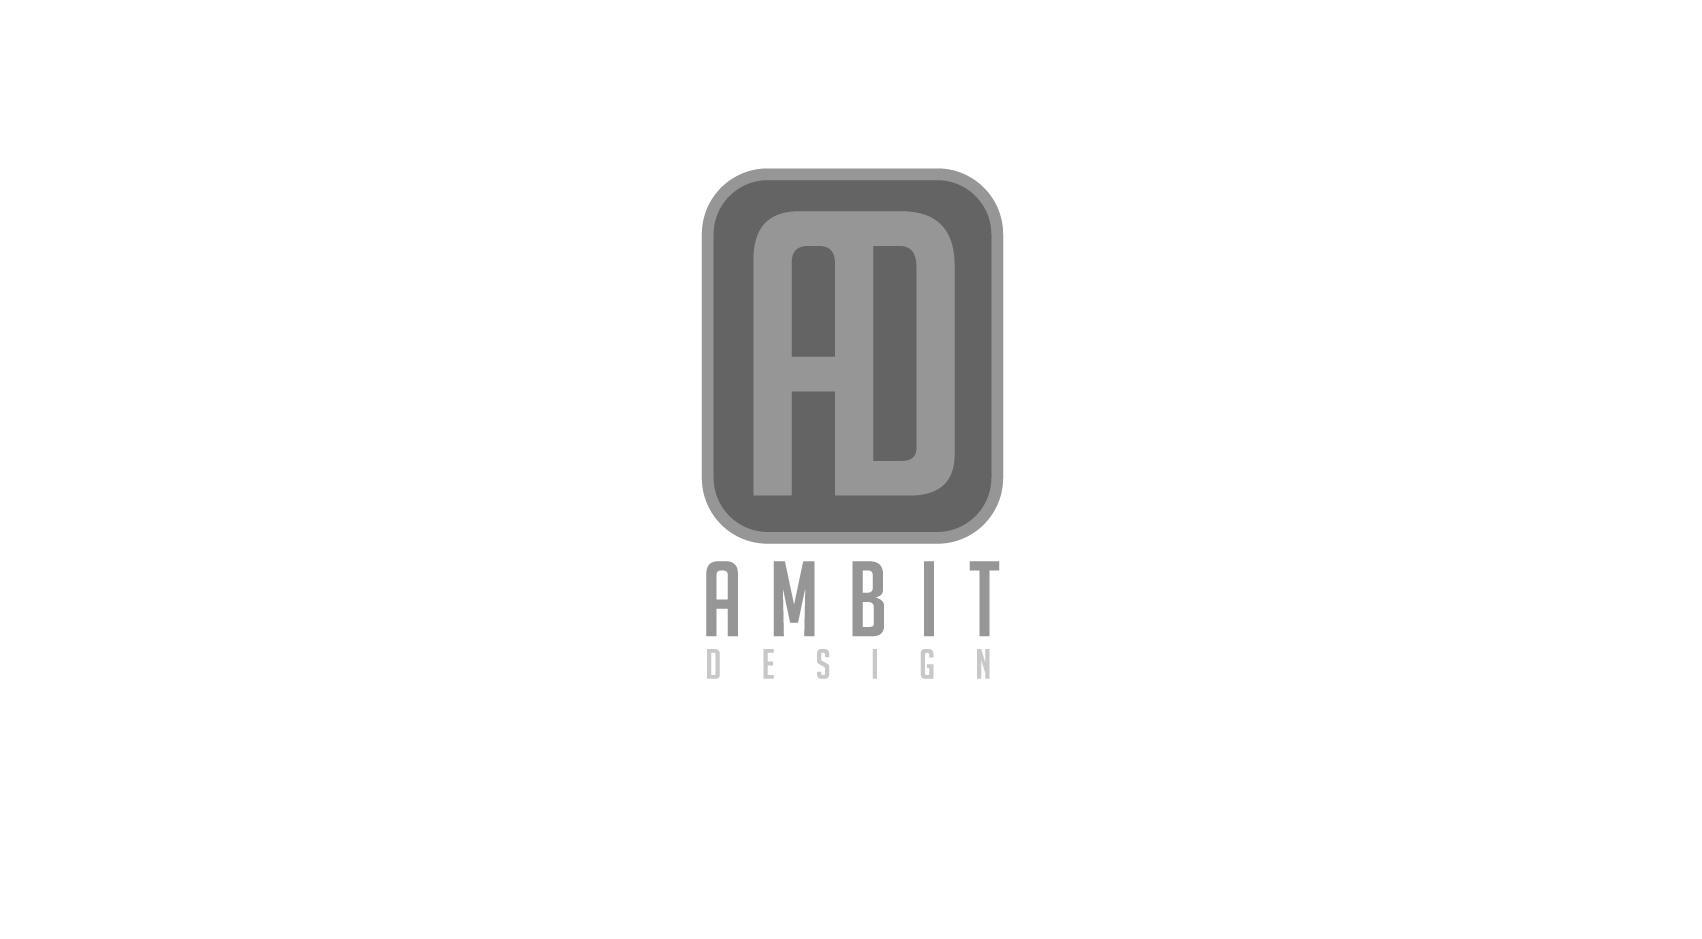 ambit-redesign-mark.jpg